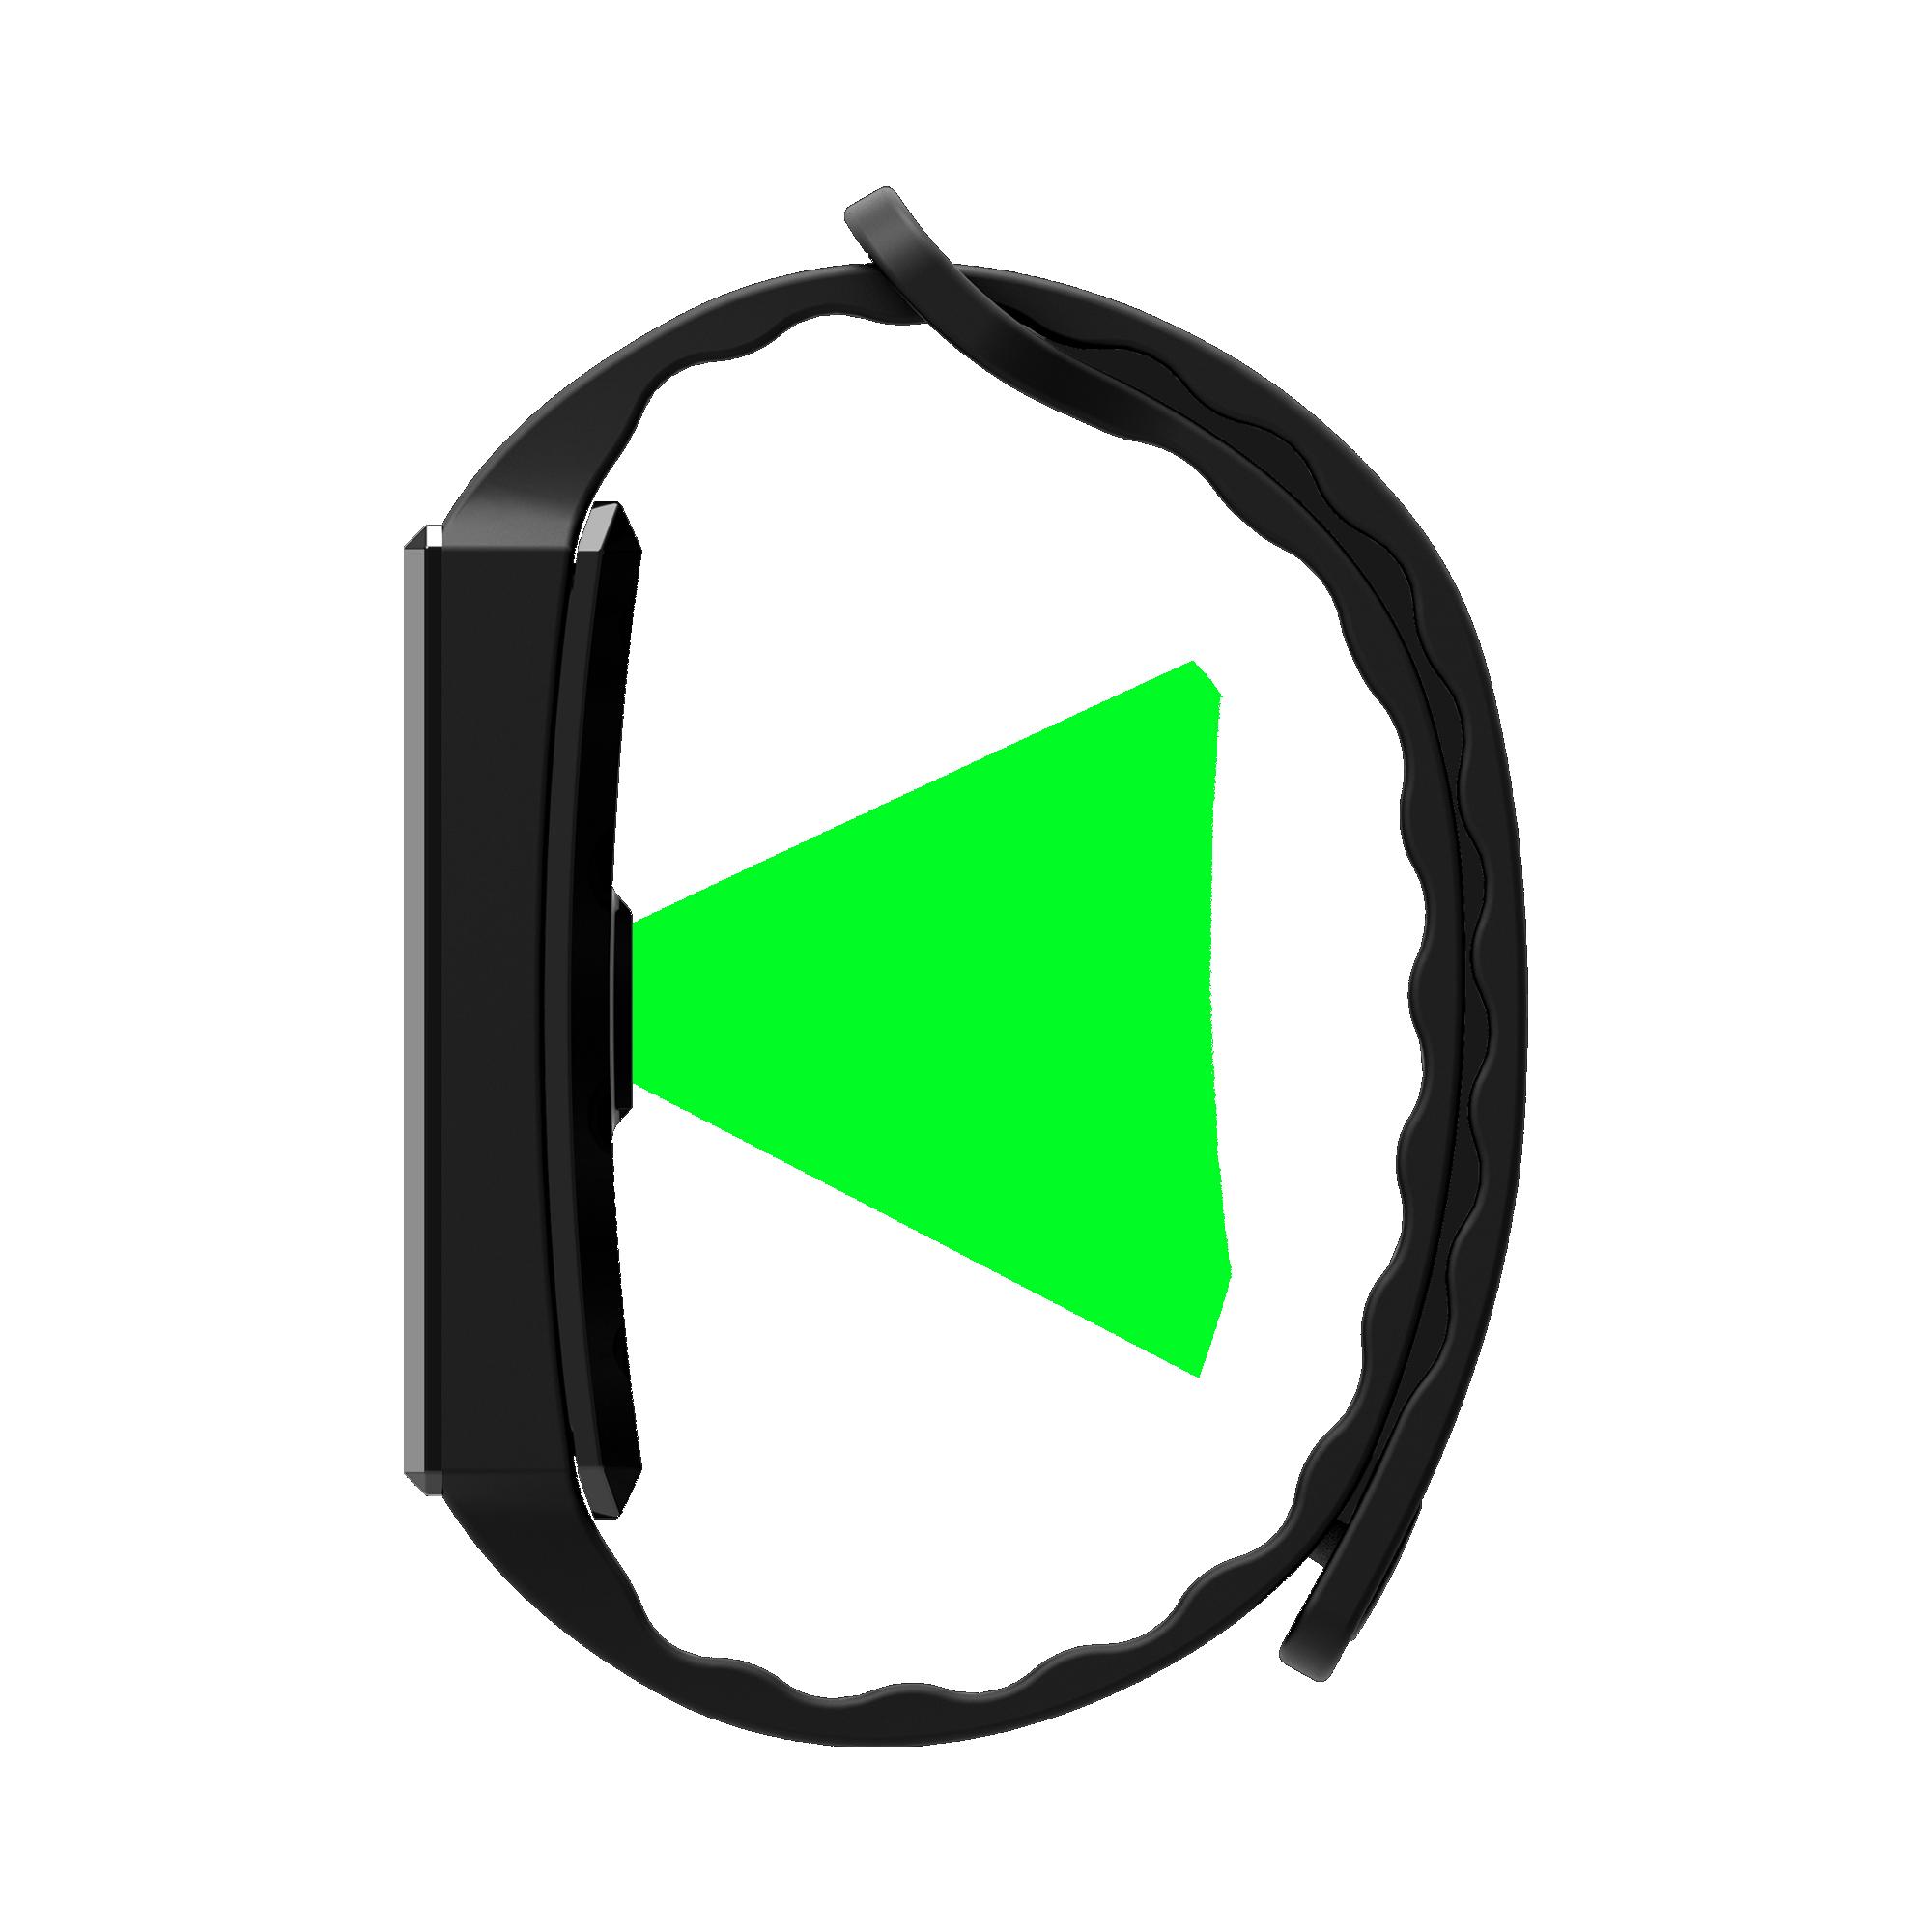 omniband